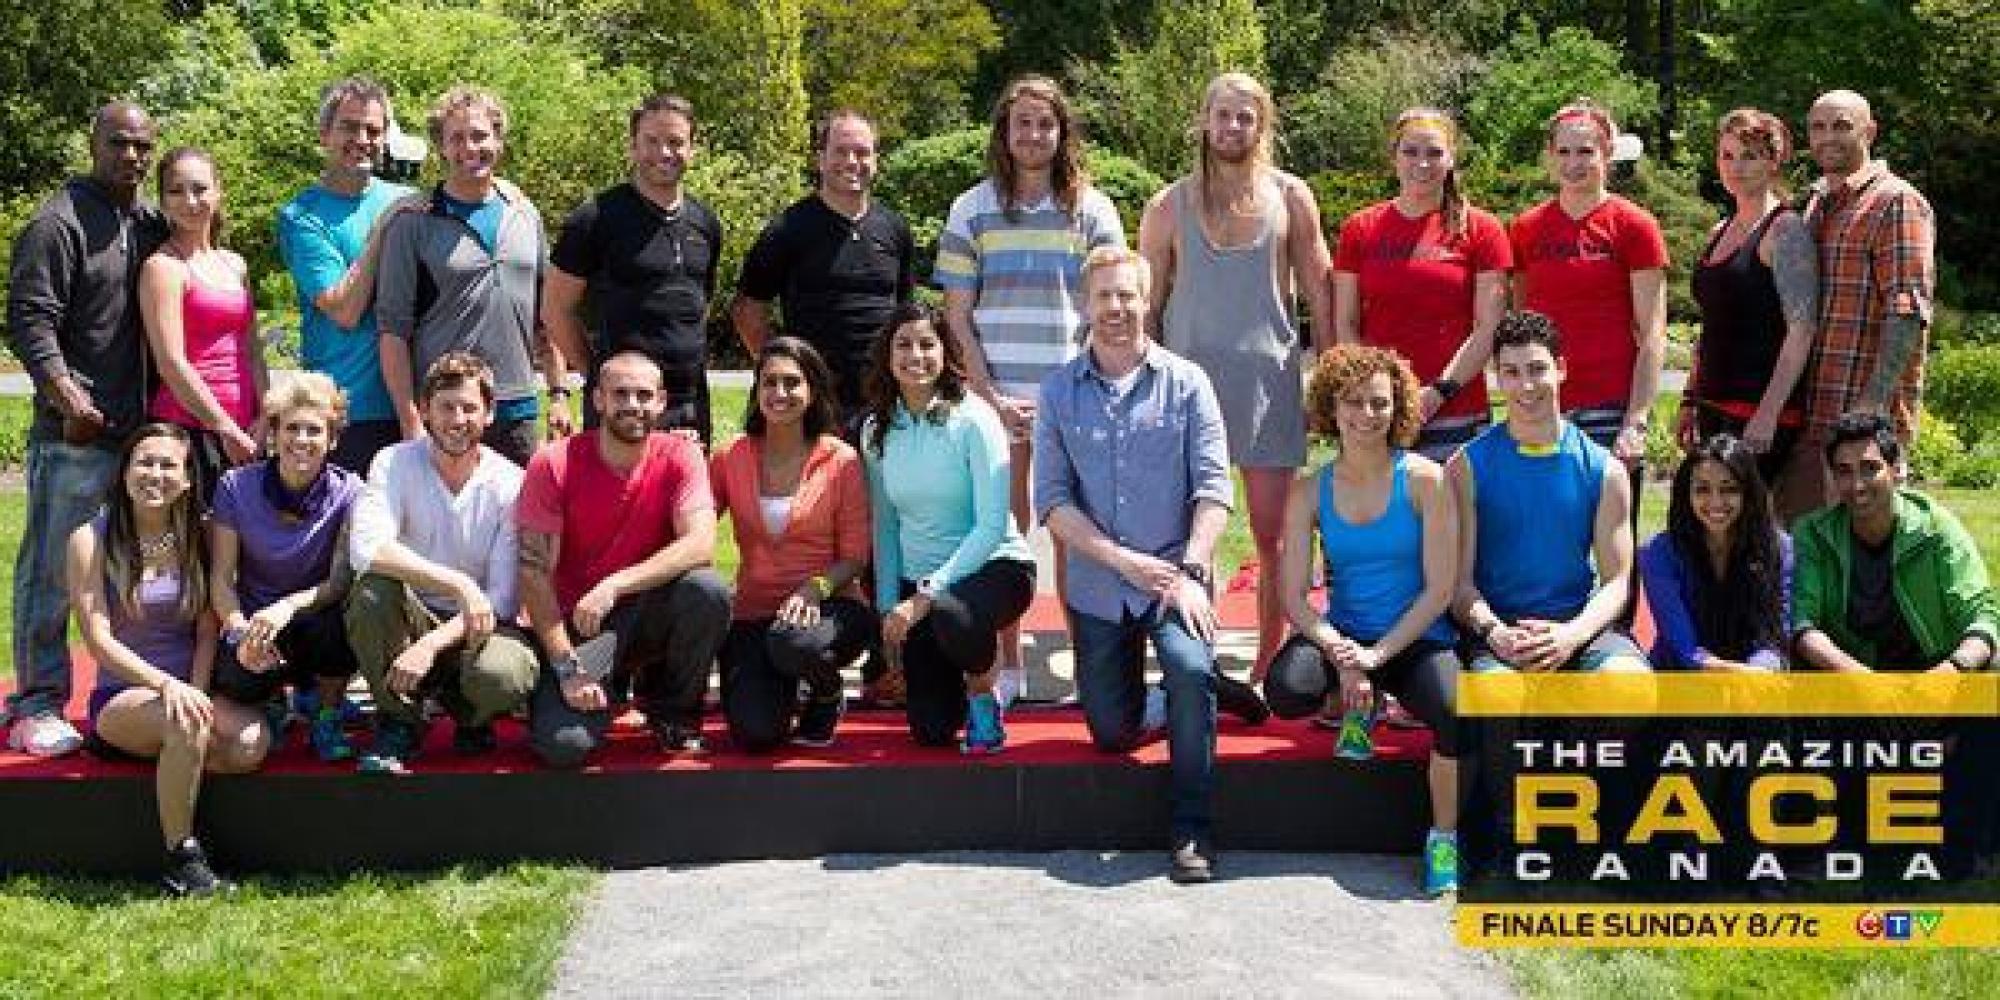 The Amazing Race Canada: Season 1